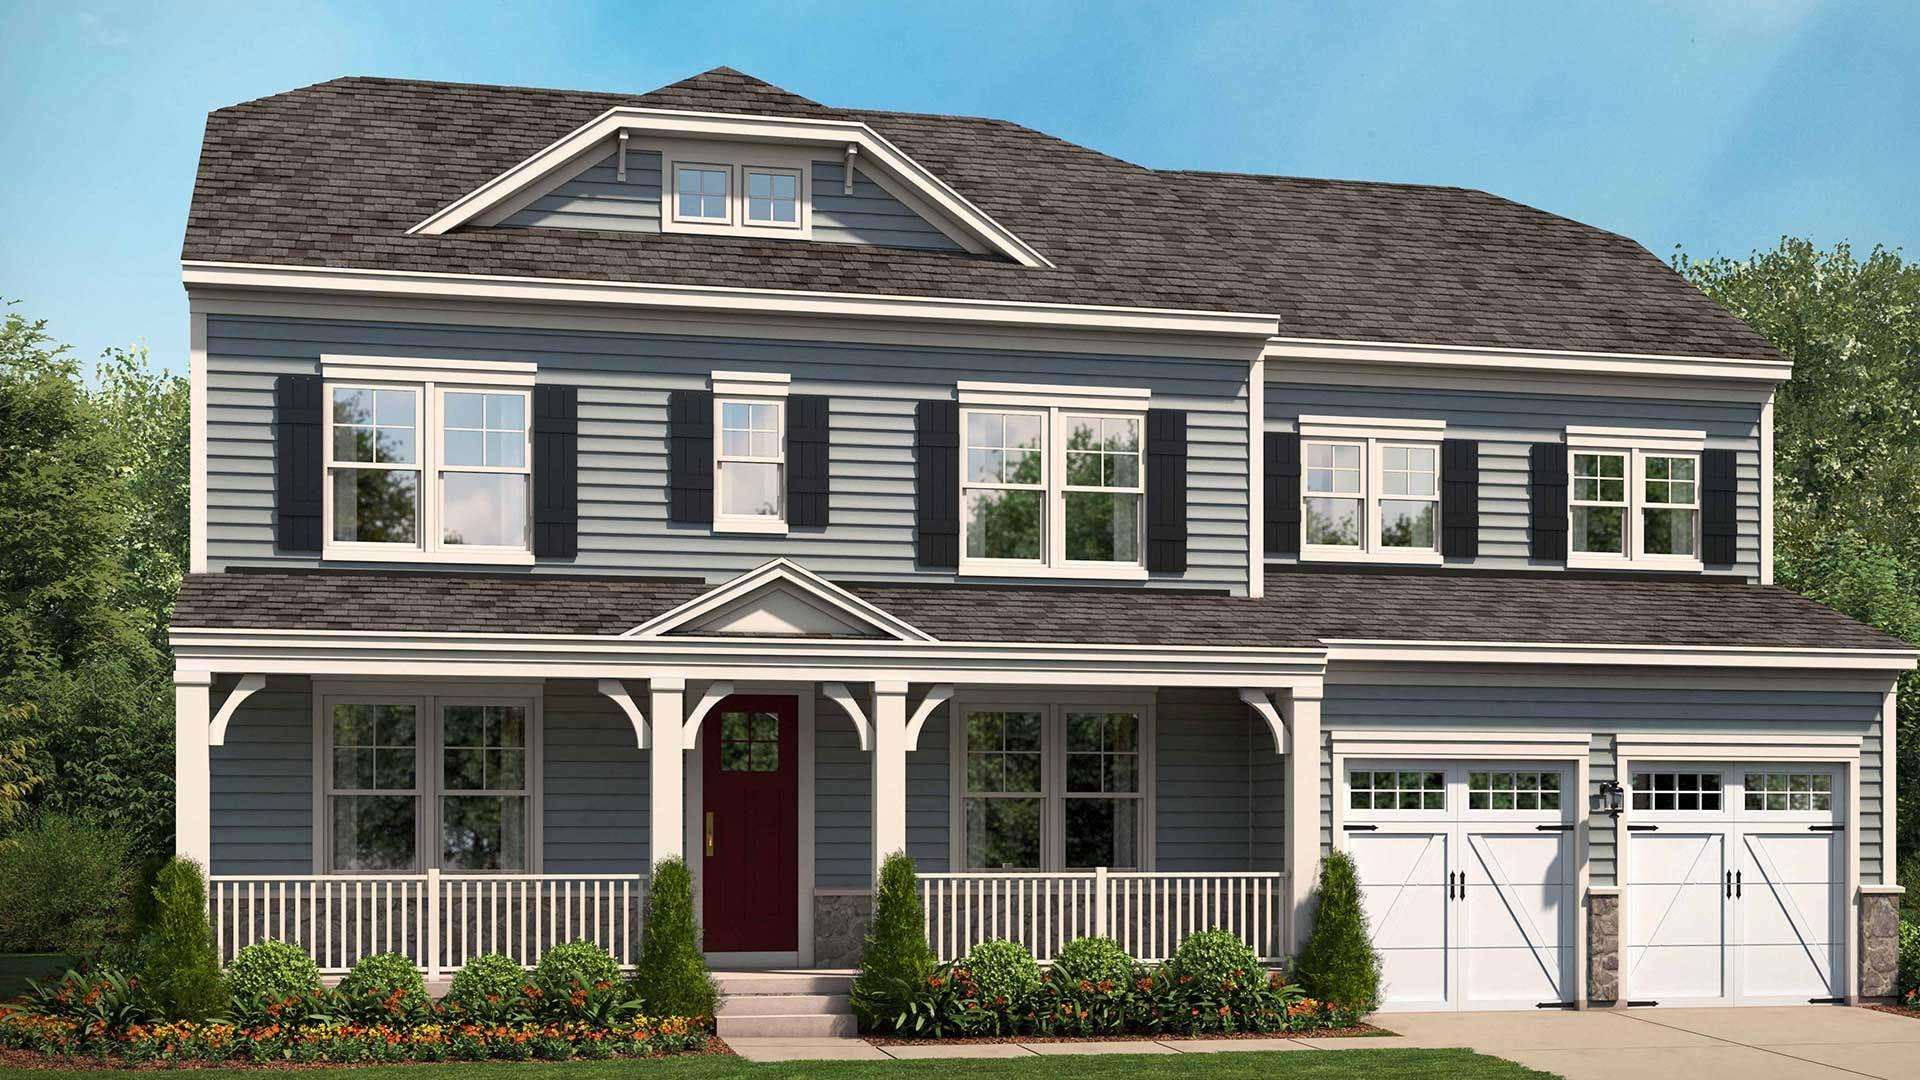 8920 Englewood Farms Drive, Manassas, VA Homes & Land - Real Estate